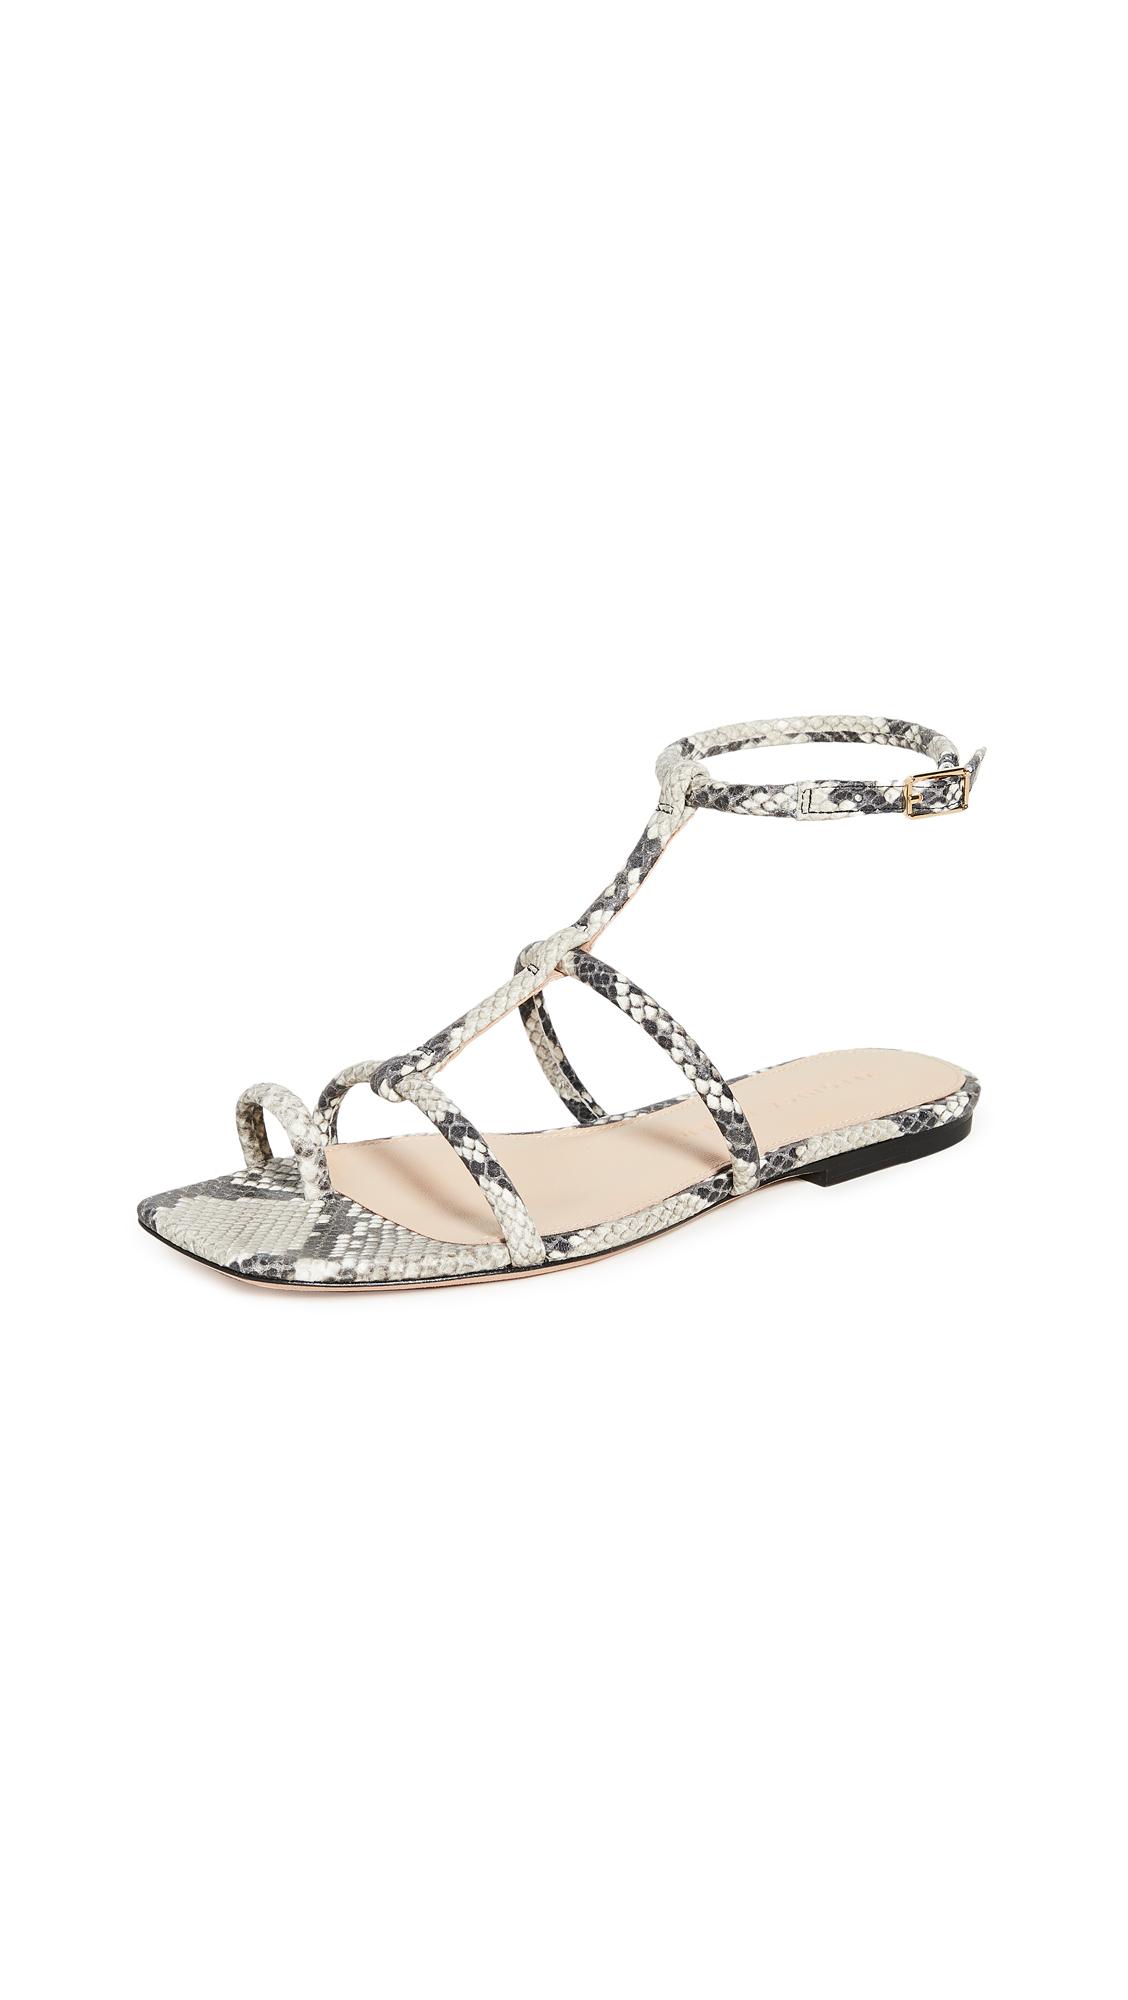 Veronica Beard Mayuri Sandals - 30% Off Sale